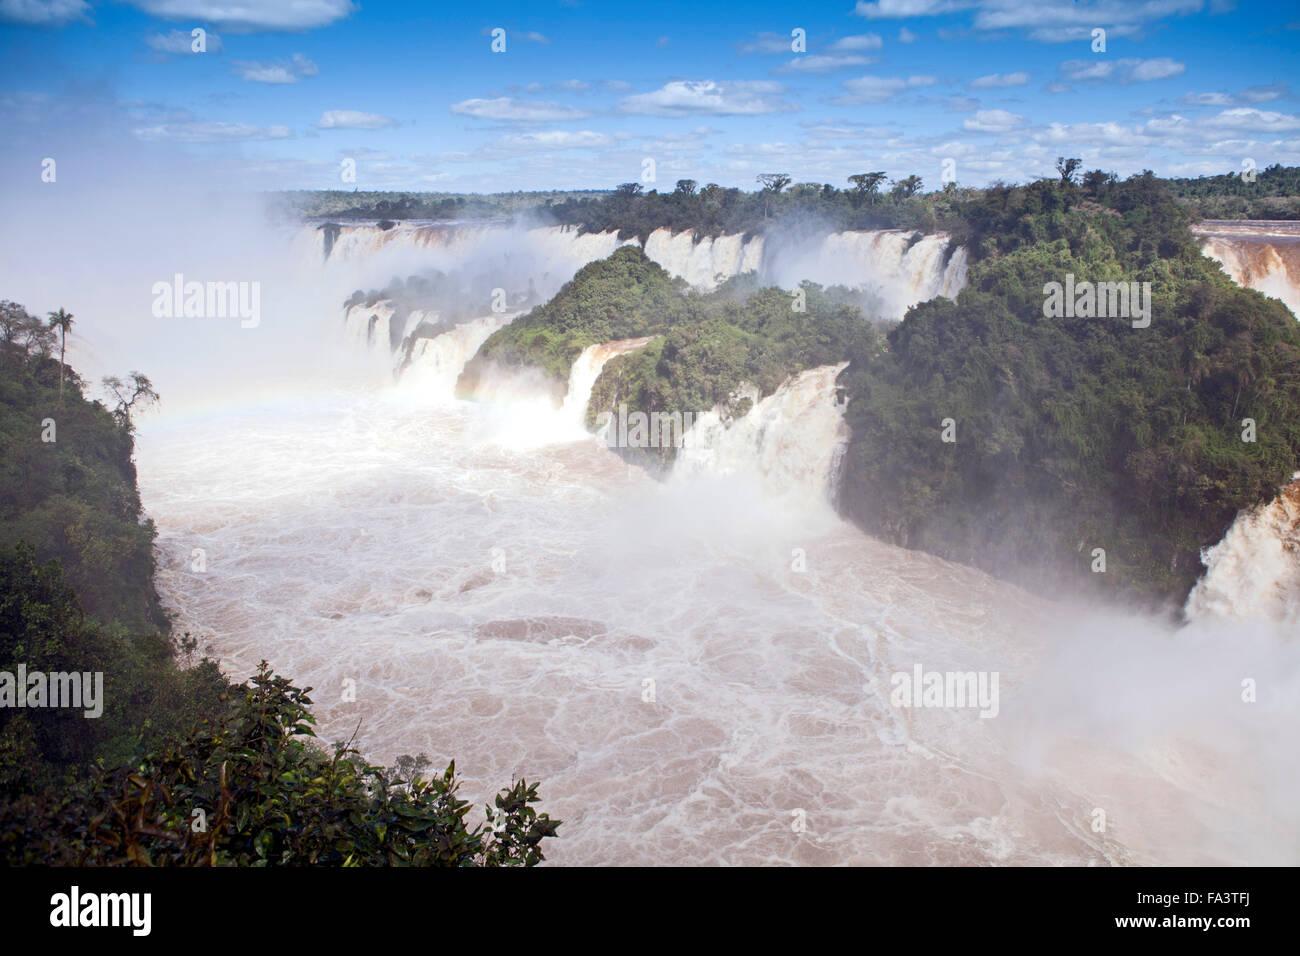 The Garganta do Diabo (Devil's Throat) at the Iguacu / Iguazu falls in the Iguassu Falls national park in Argentina - Stock Image